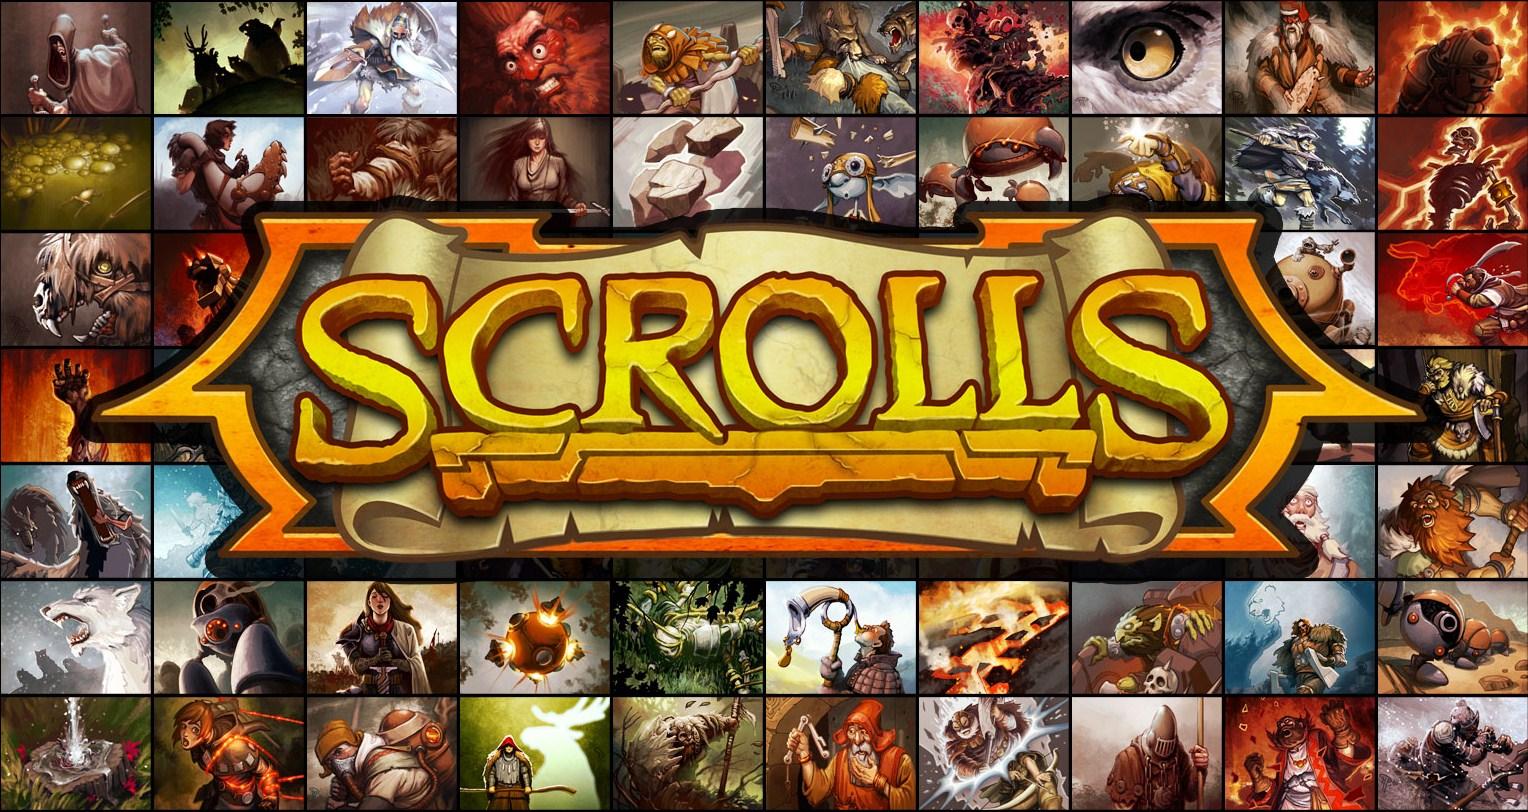 ScrollsLogo.jpg (1528×812)